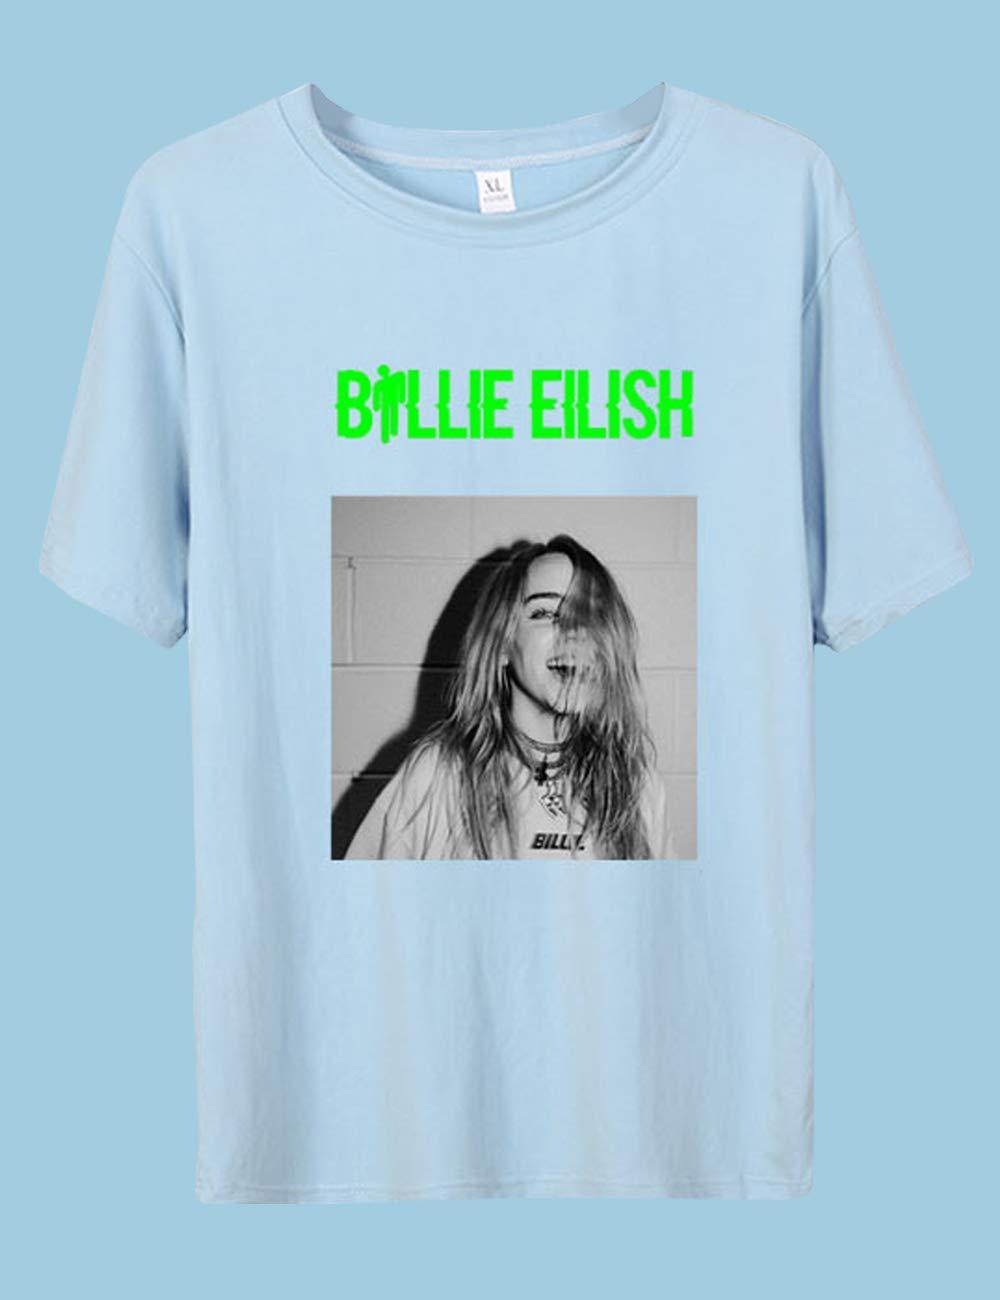 Siennaa Billie Eilish Tshirt Damen,Teenager M/ädchen Bellyache Neon Gr/ün 3D Druck Shirt Frauen Herren Bad Guy Sommer T-Shirts When We All Fall Asleep Kurzarm Tshirts Shirt Oberteile Tops Merch